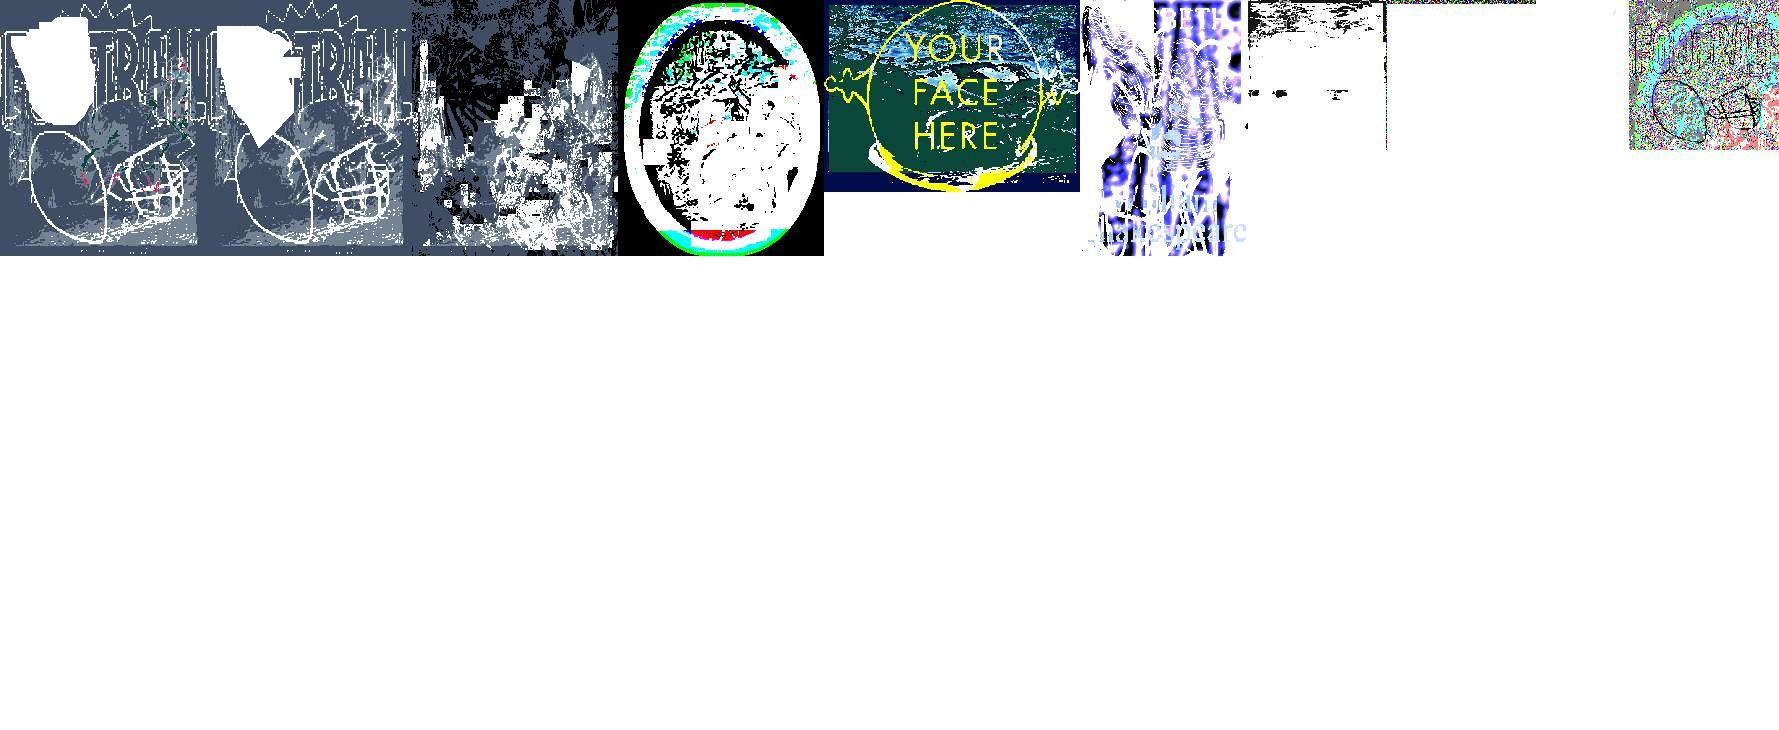 literature_and_fiction,_text,_helmet--23971-76659-97087.jpg